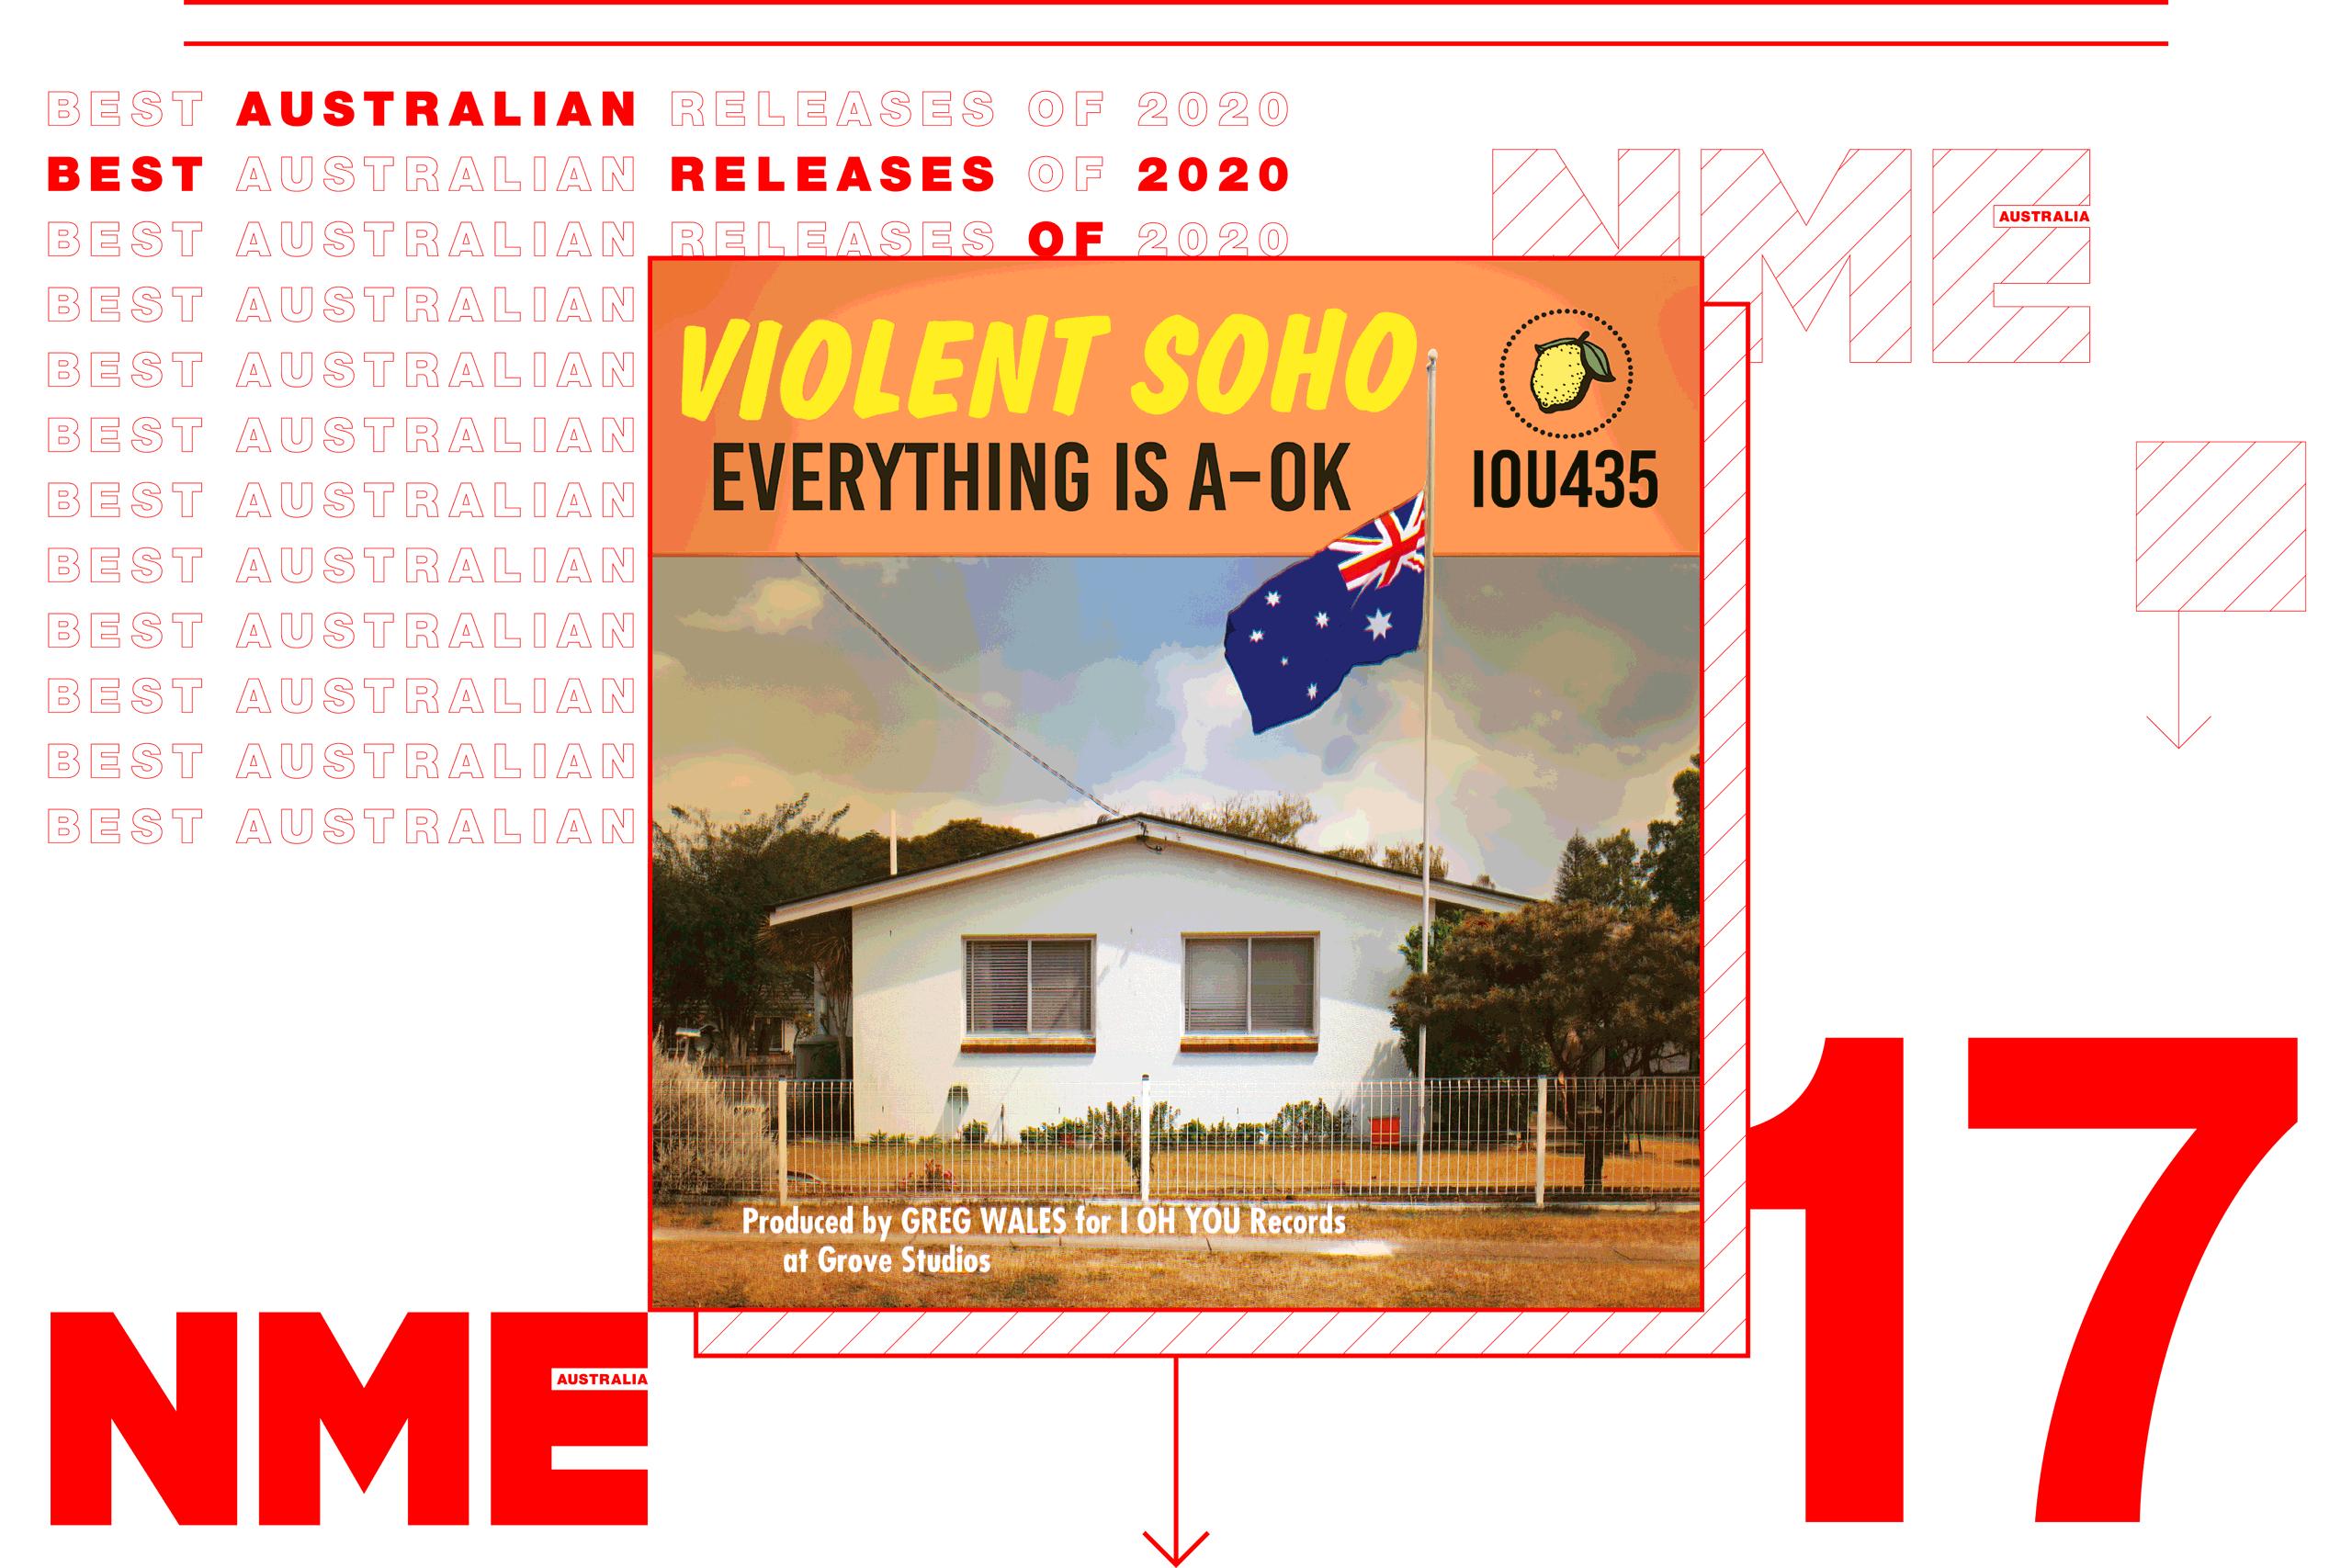 NME Australian Album Release 17